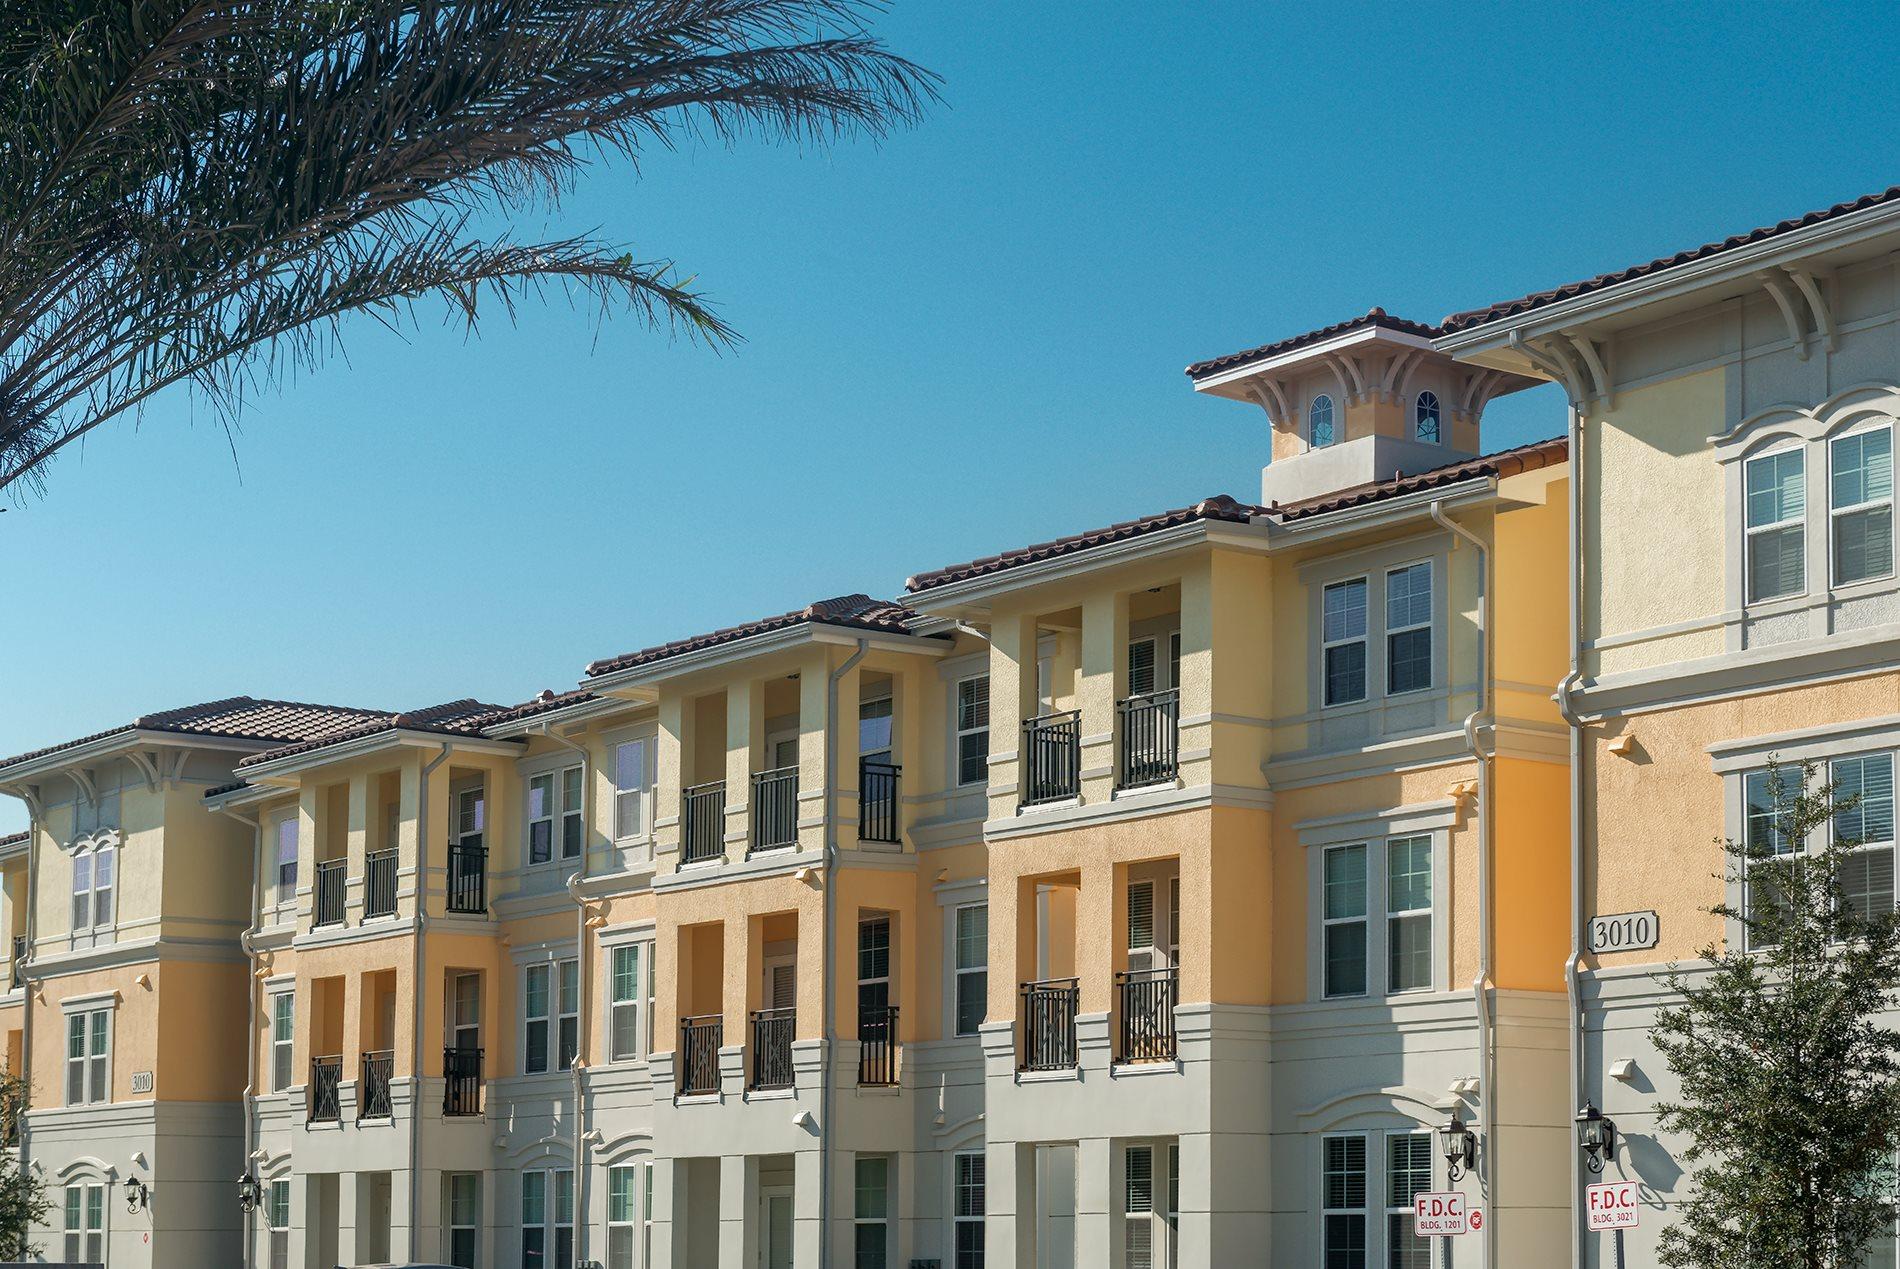 Renovated Apartment Homes Available at Orlando Apartments_Lugano Apartments_Luxury Apartments in Kissimmee, Florida